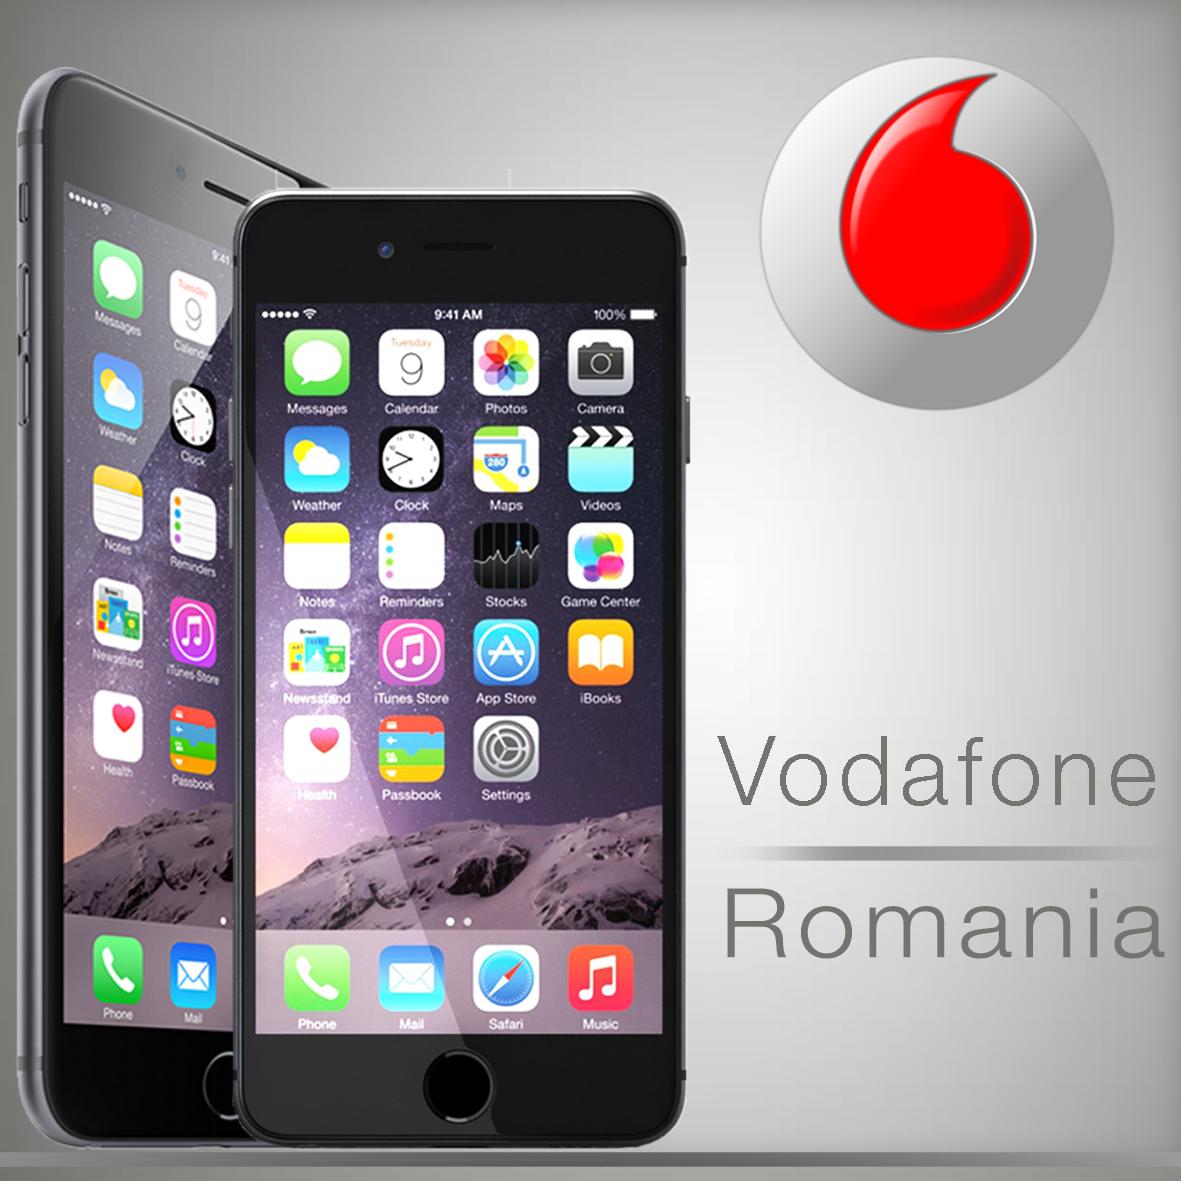 Unlock Vodafone Romania iPhone 6 Plus 6 5s 5c 5 4s 4